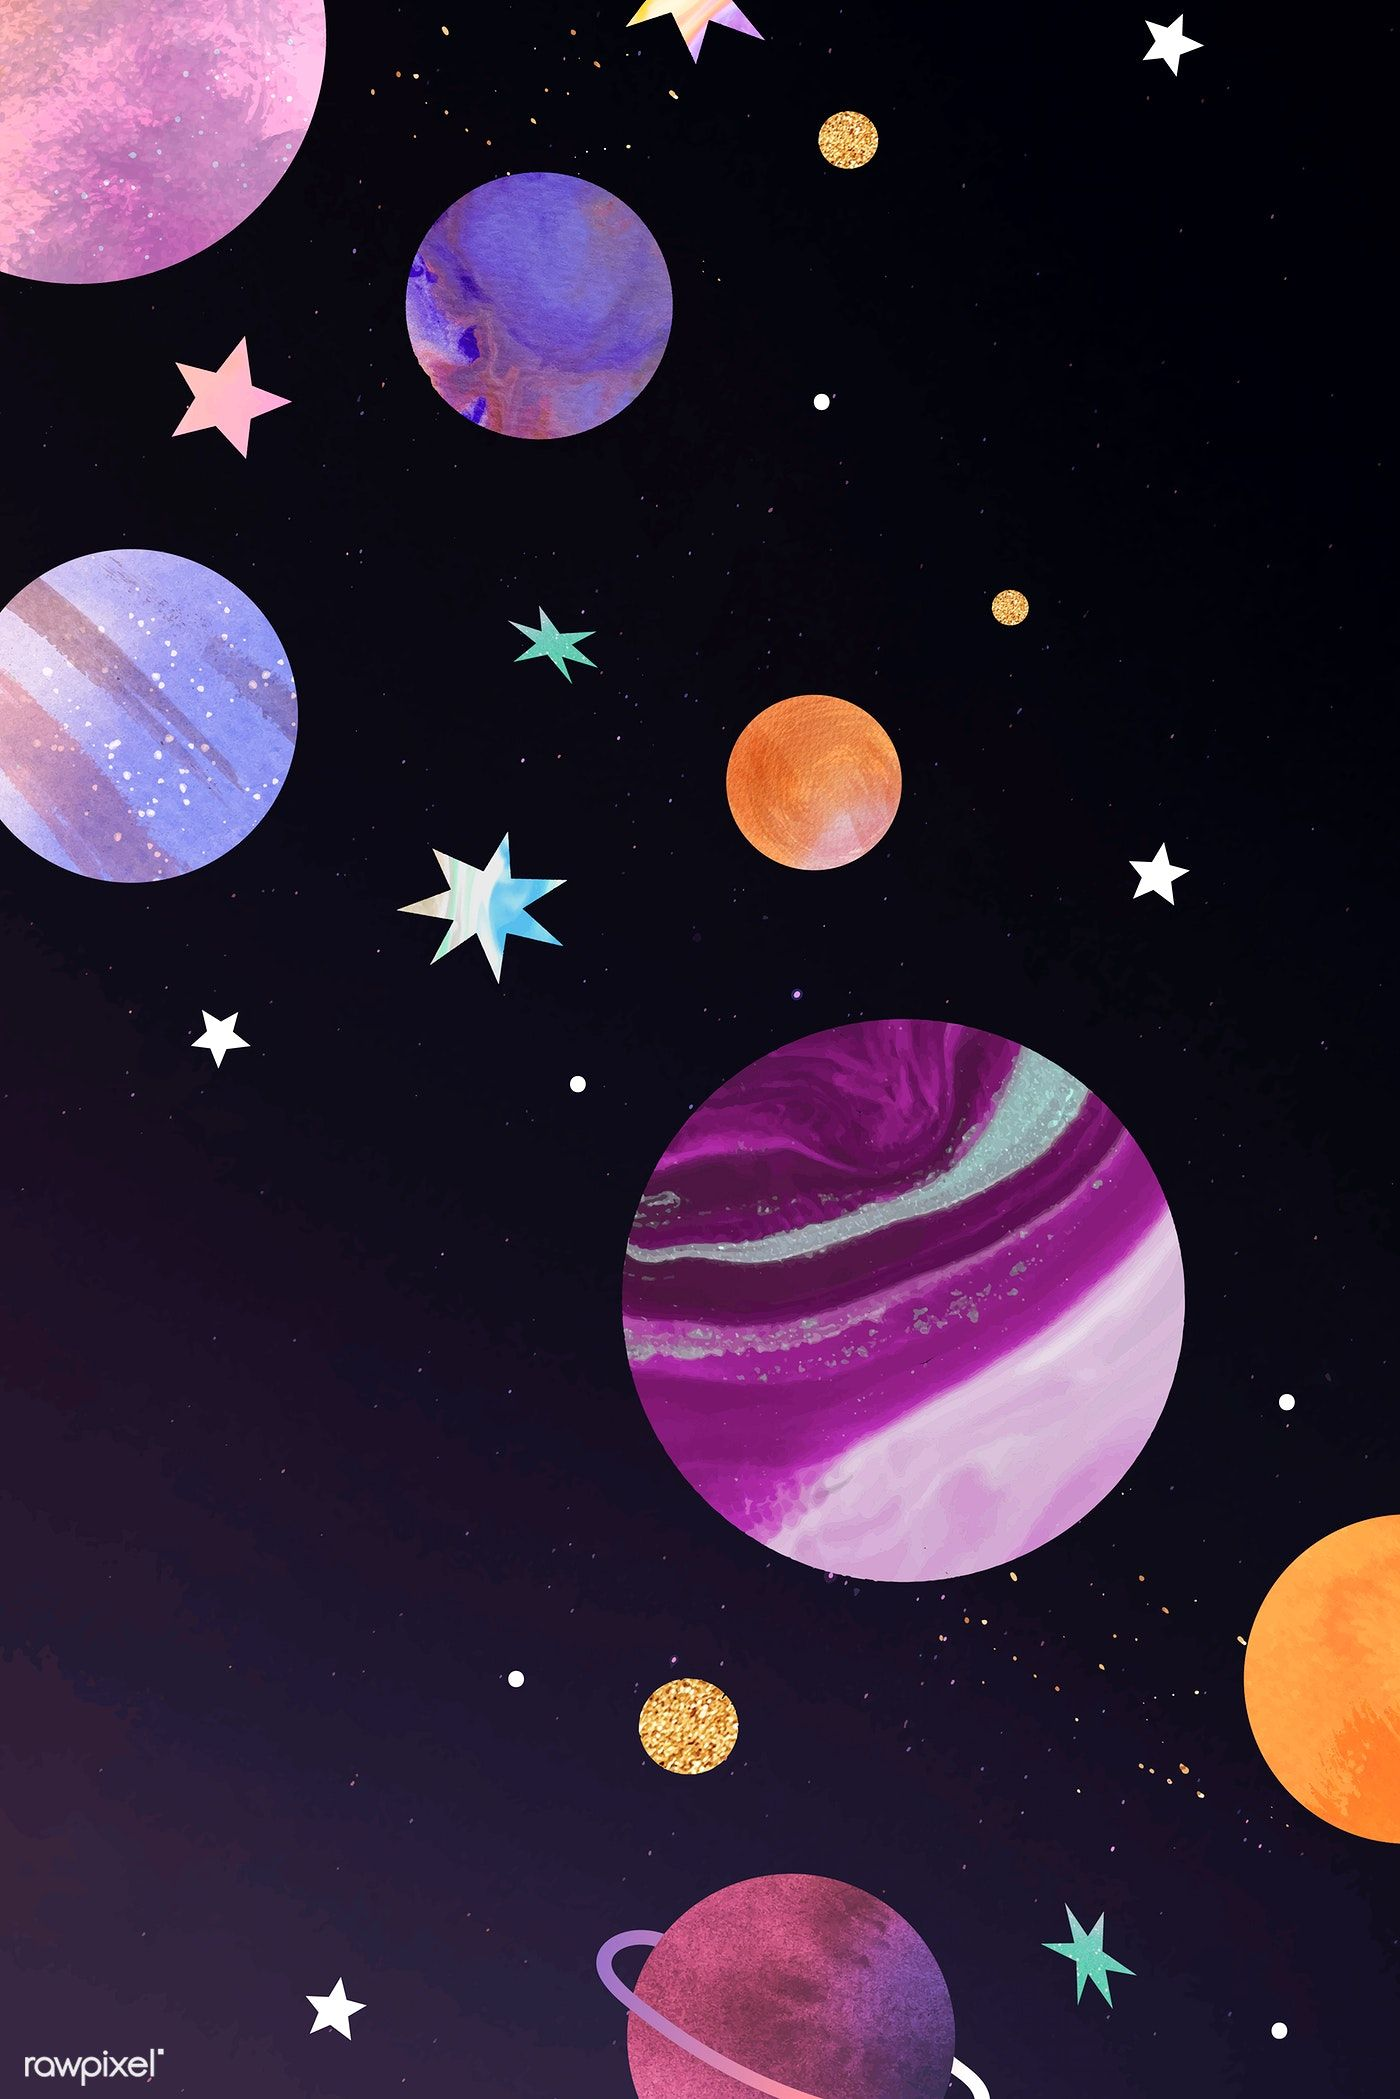 Download Premium Vector Of Colorful Galaxy Watercolor Doodle On Black Watercolor Galaxy Cute Galaxy Wallpaper Space Drawings